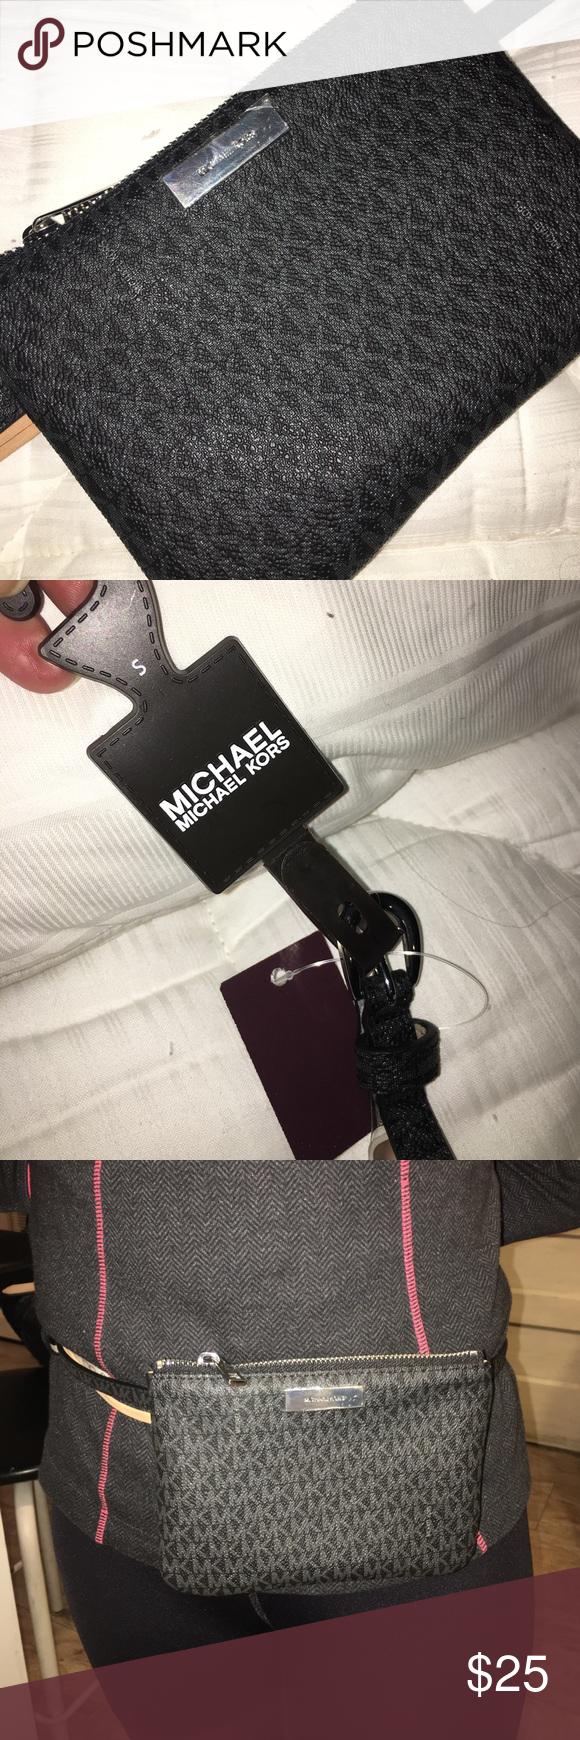 Michael Kors  Fannie pack Small little Fannie pack. Super cute! MICHAEL Michael Kors Bags Mini Bags